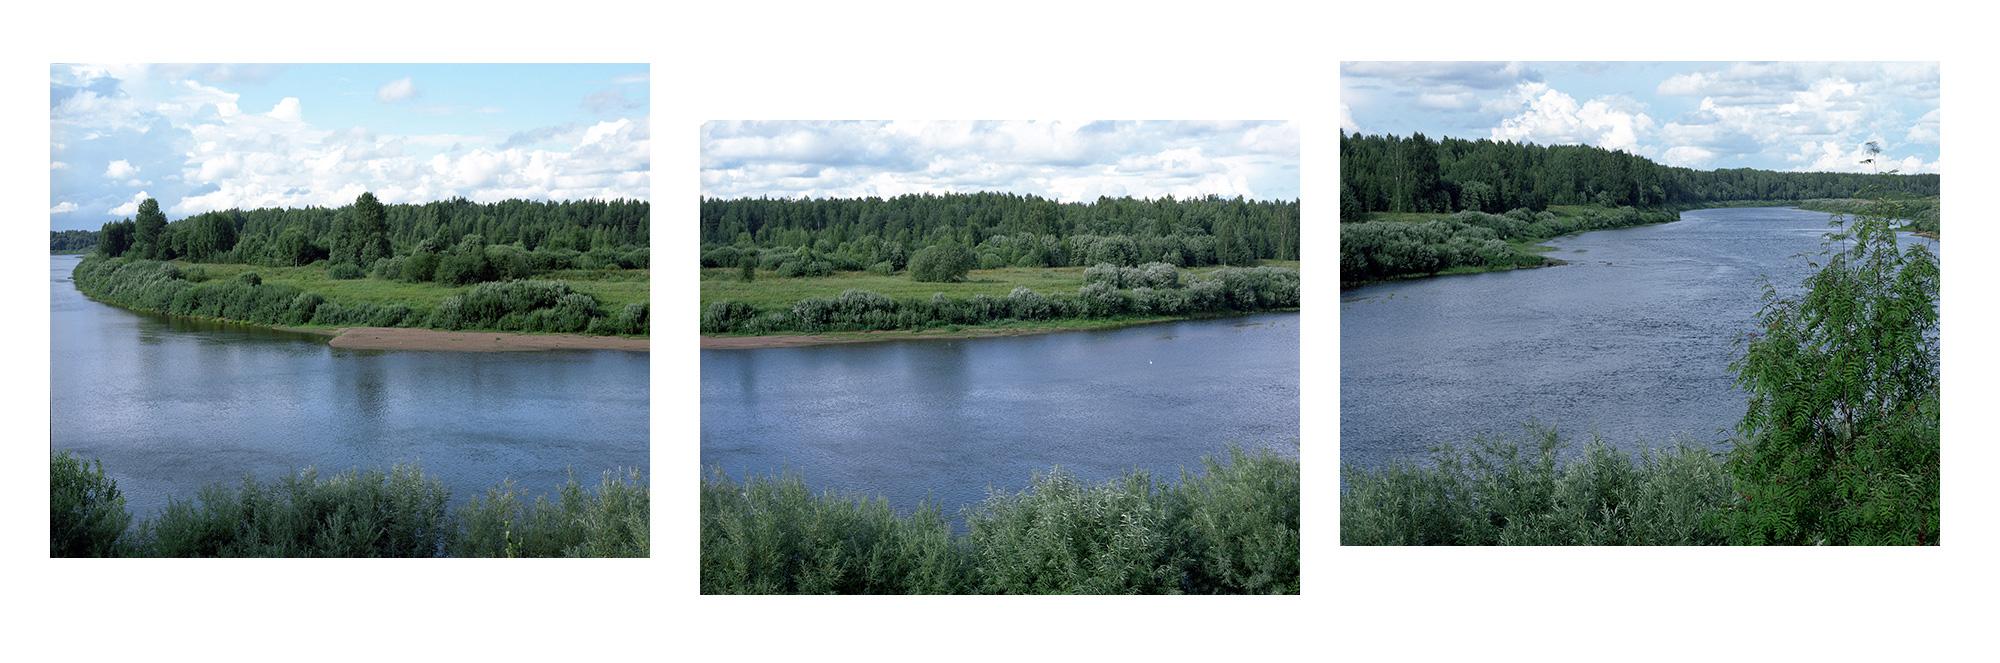 Beim Dorf Tschastowa, Fluss Msta